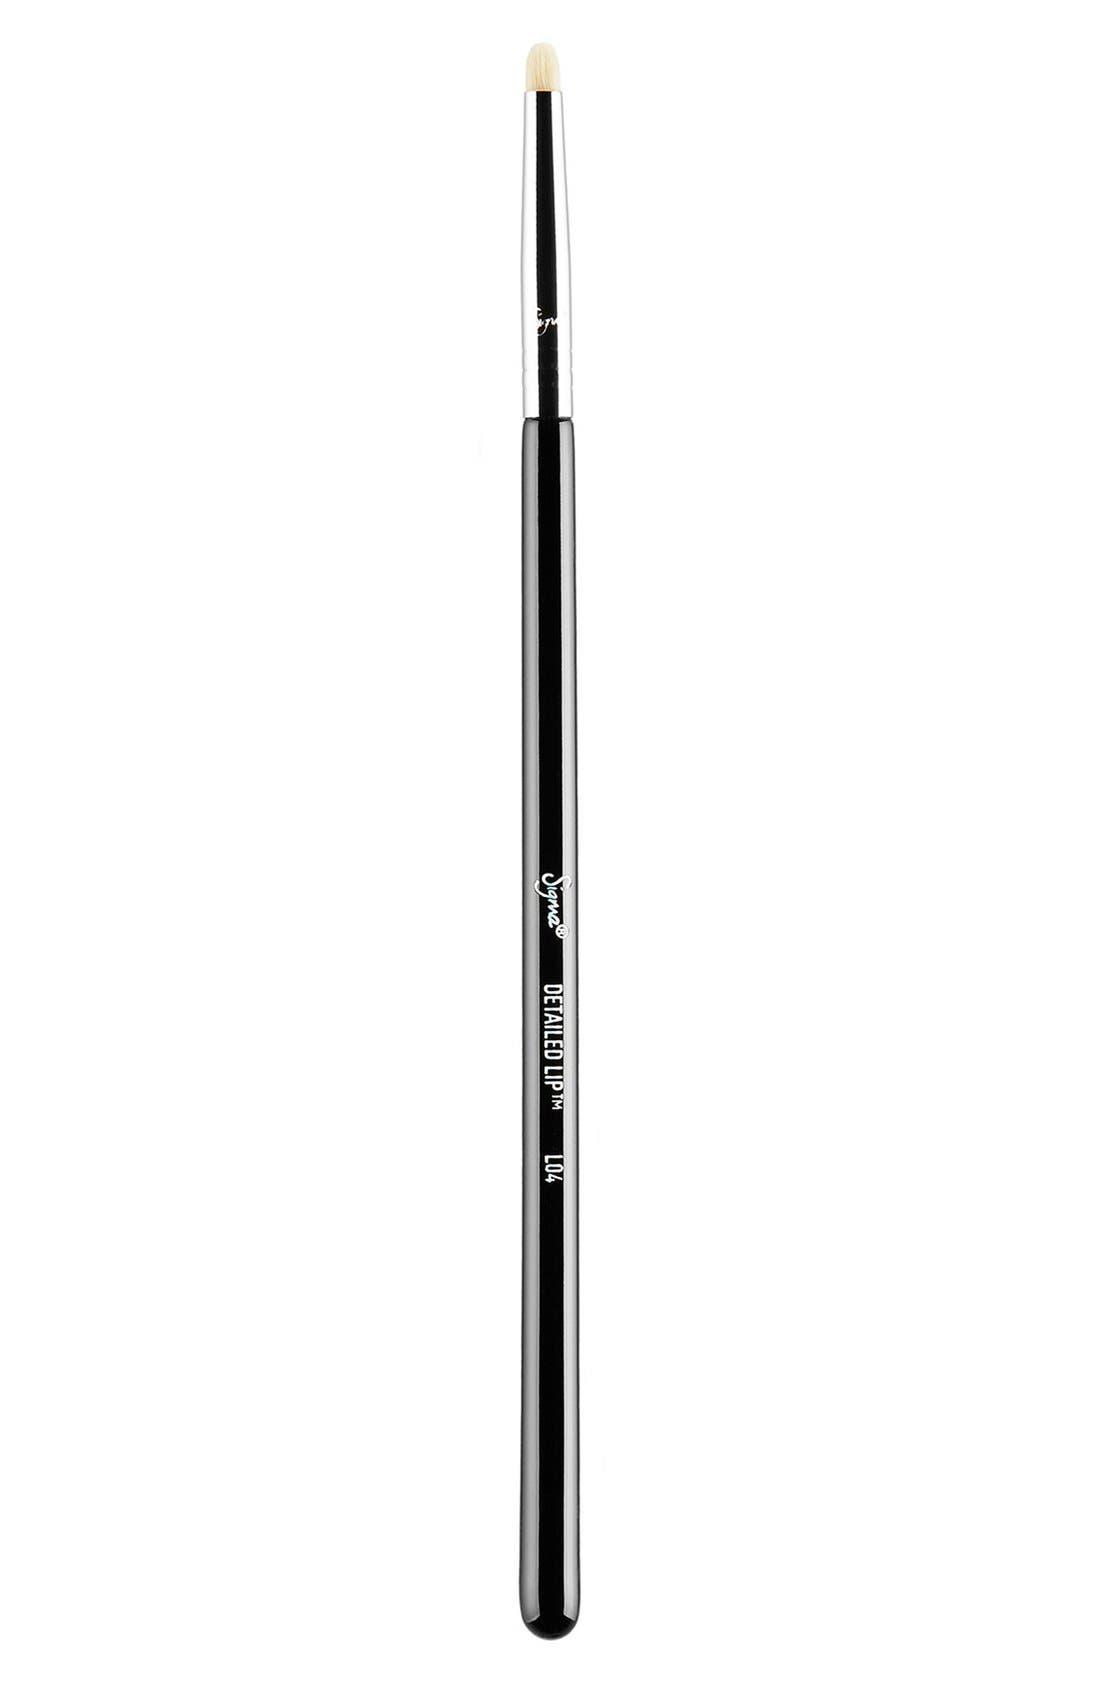 L04 Detailed Lip Brush,                             Main thumbnail 1, color,                             NO COLOR